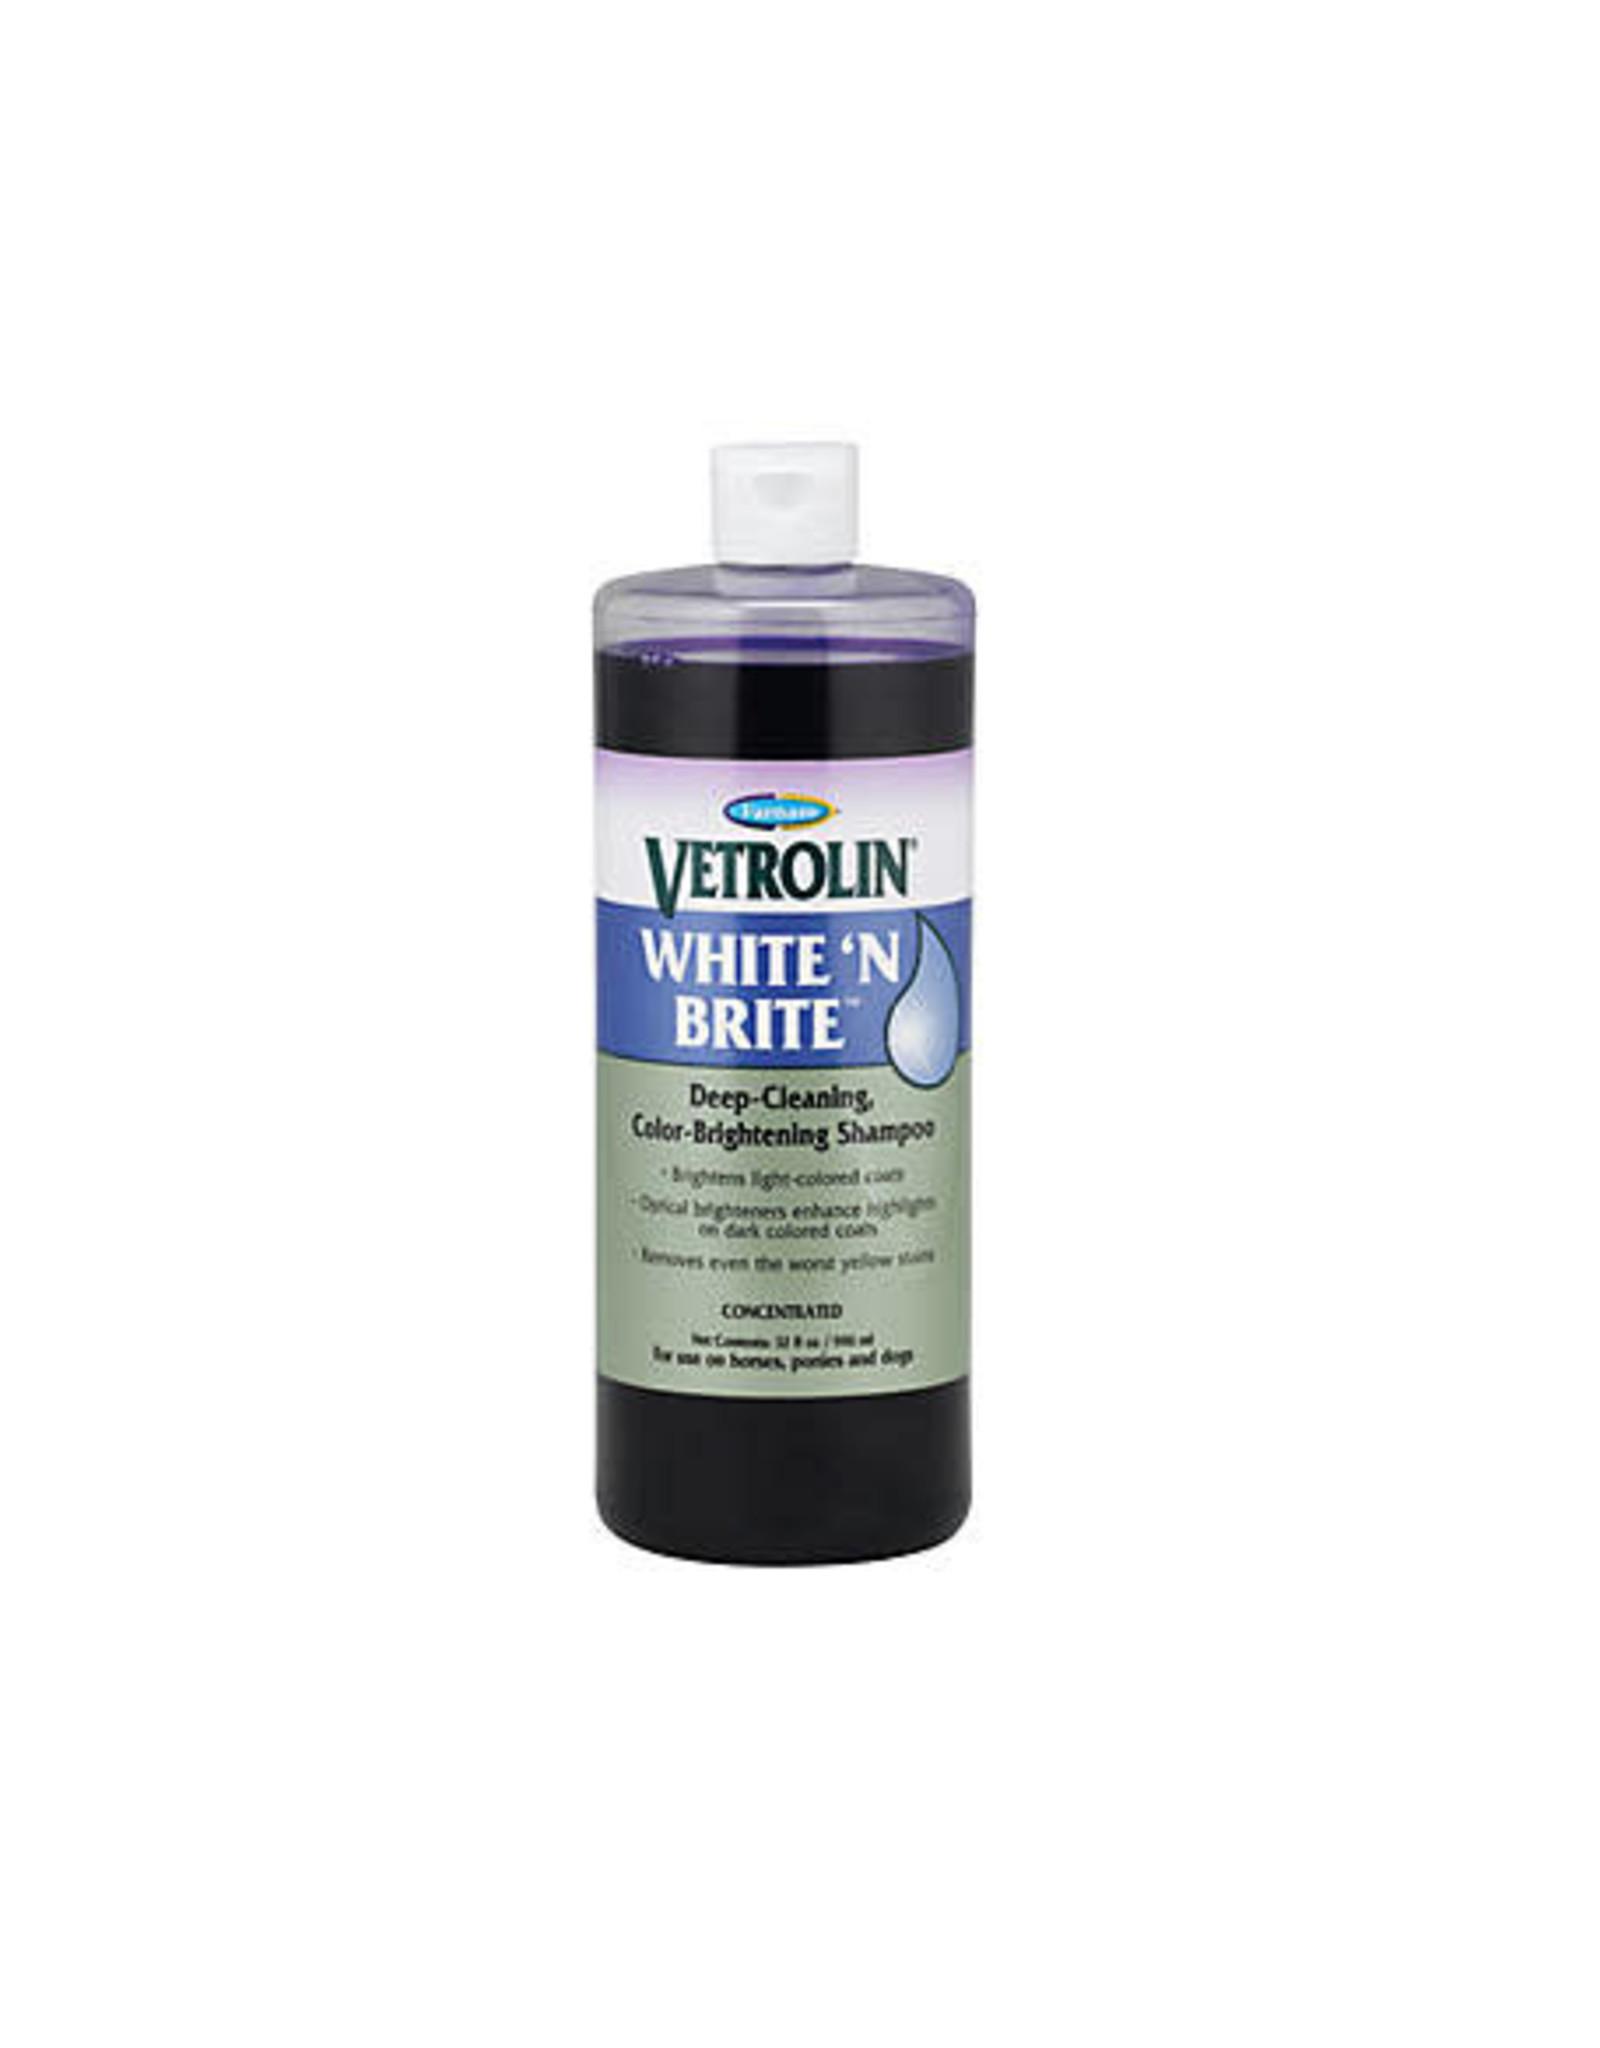 Vetrolin White N Brite 32 oz